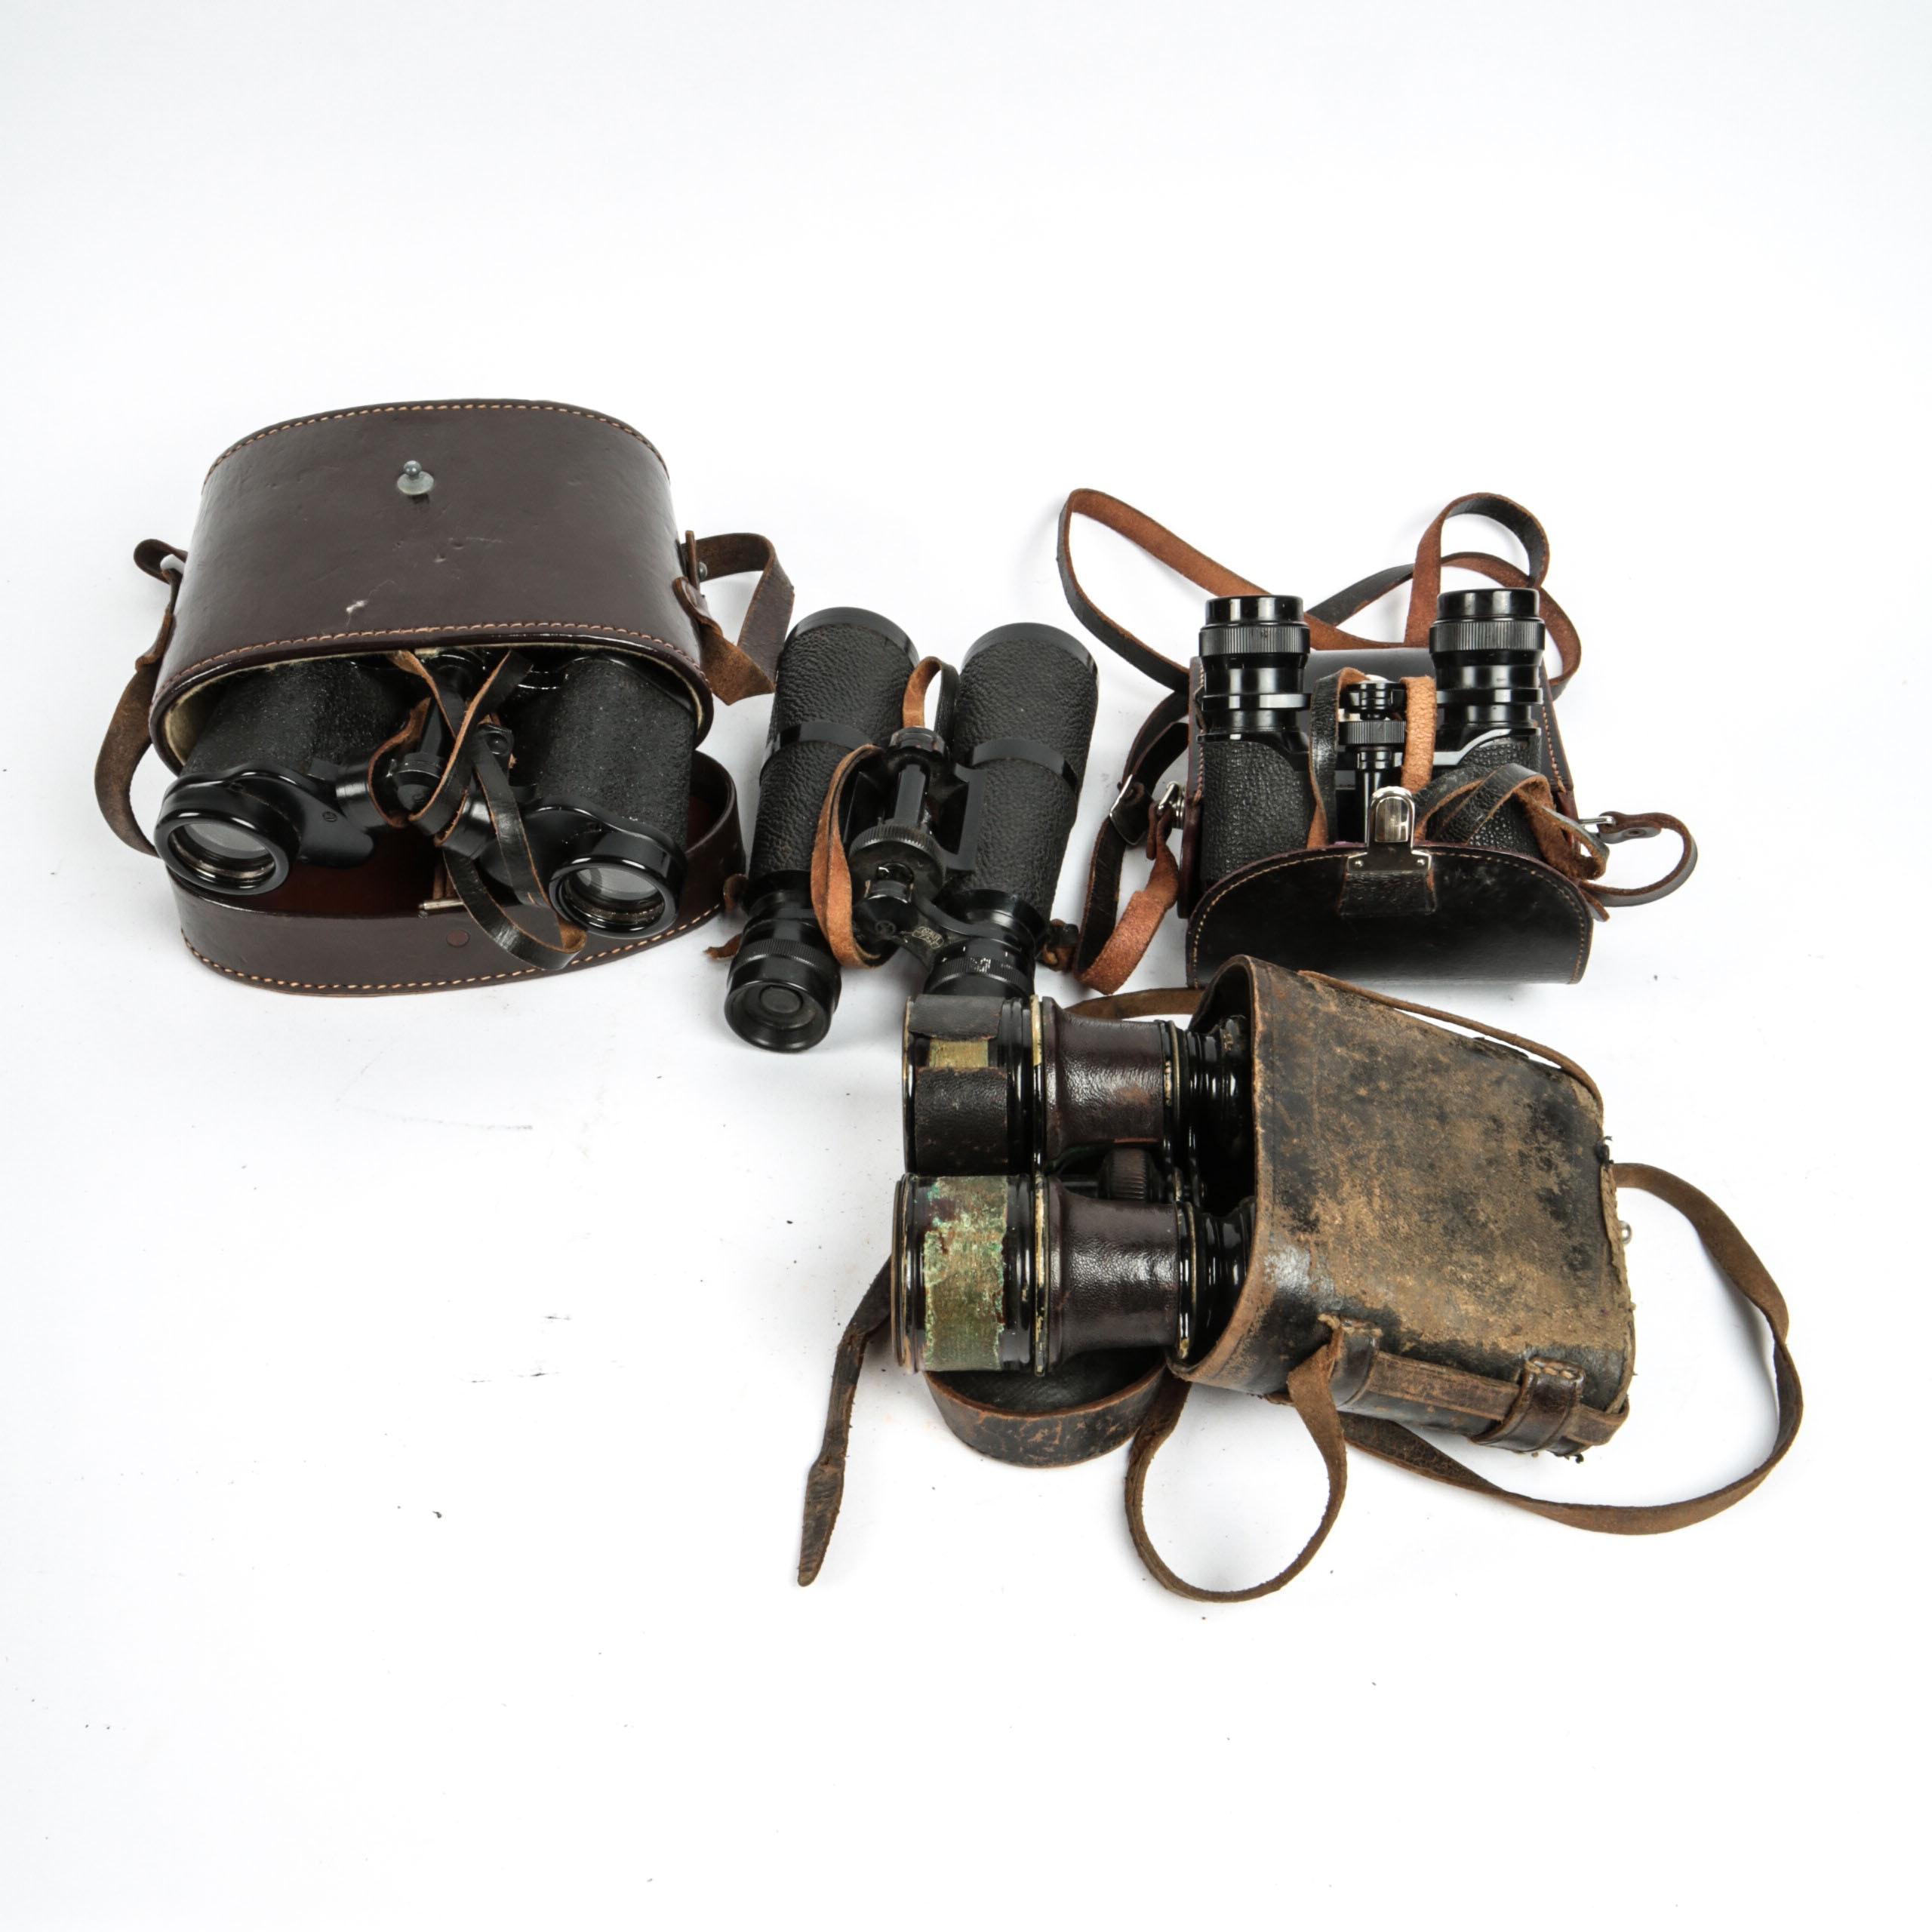 Vintage Binoculars Including WWII-Era